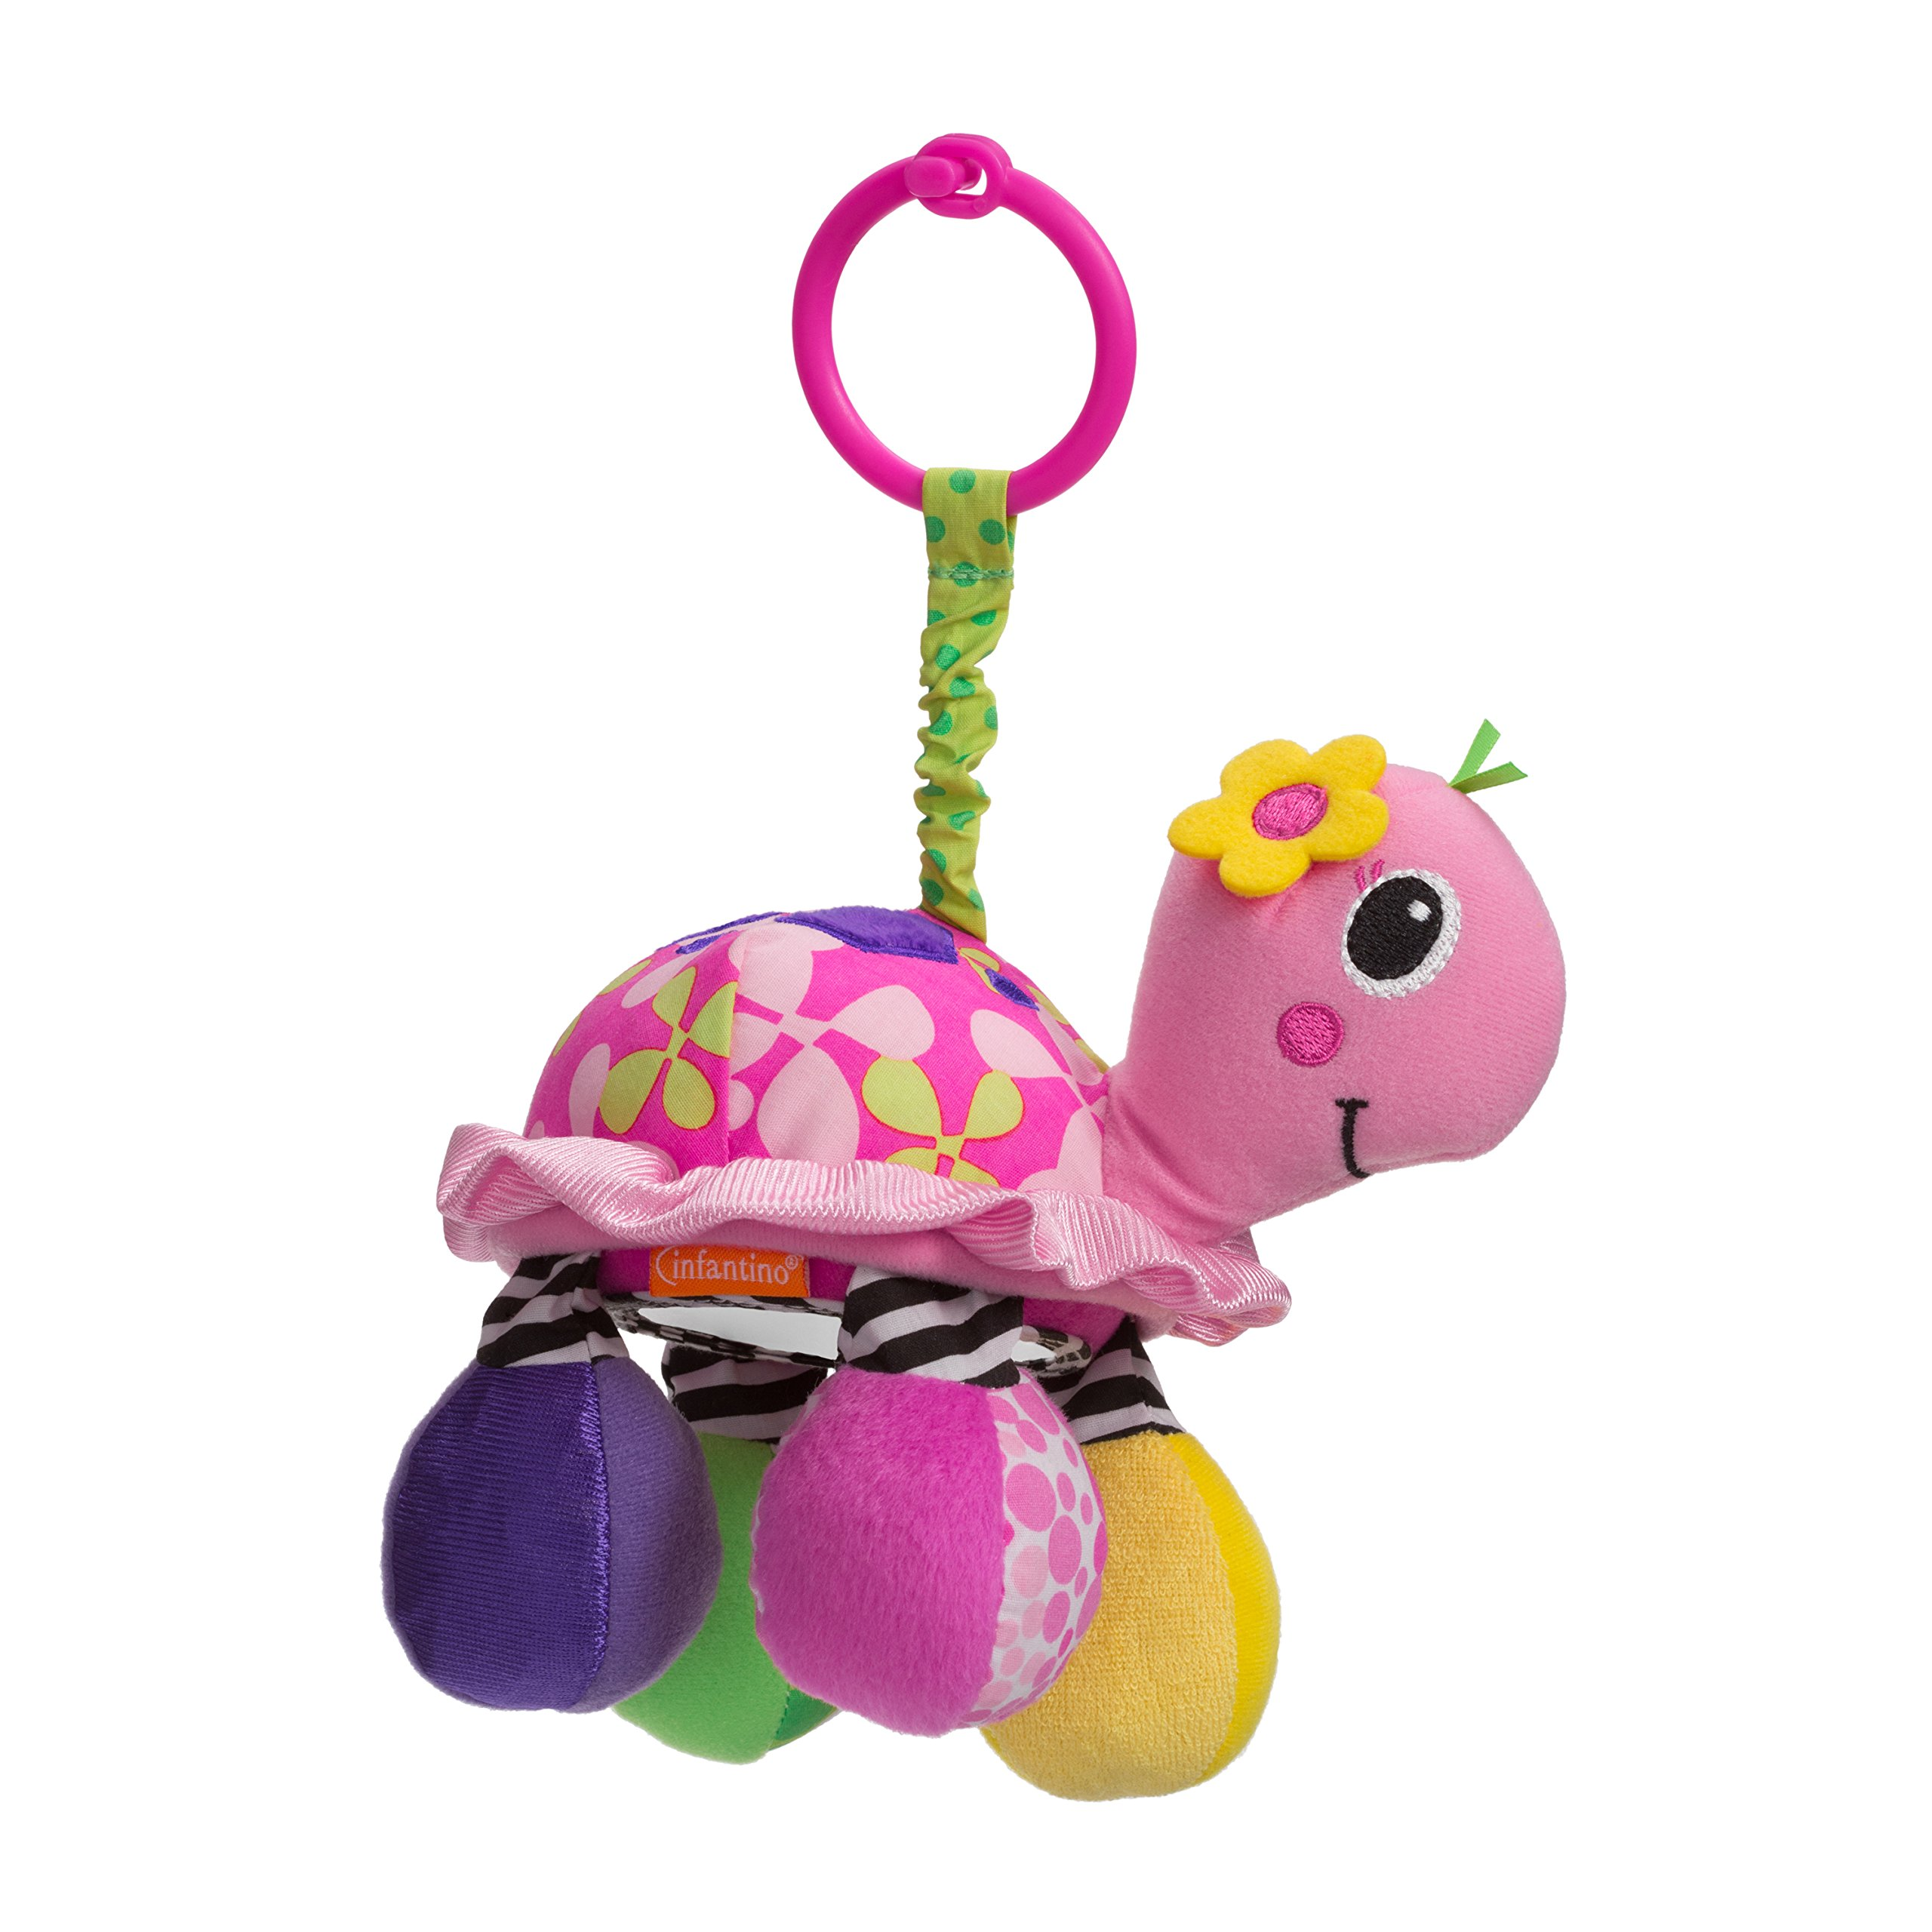 Amazoncom Playgro 0181201 Aktivitet Friend Blossom Butterfly Baby Legetøj Baby Legetøj Baby-3714